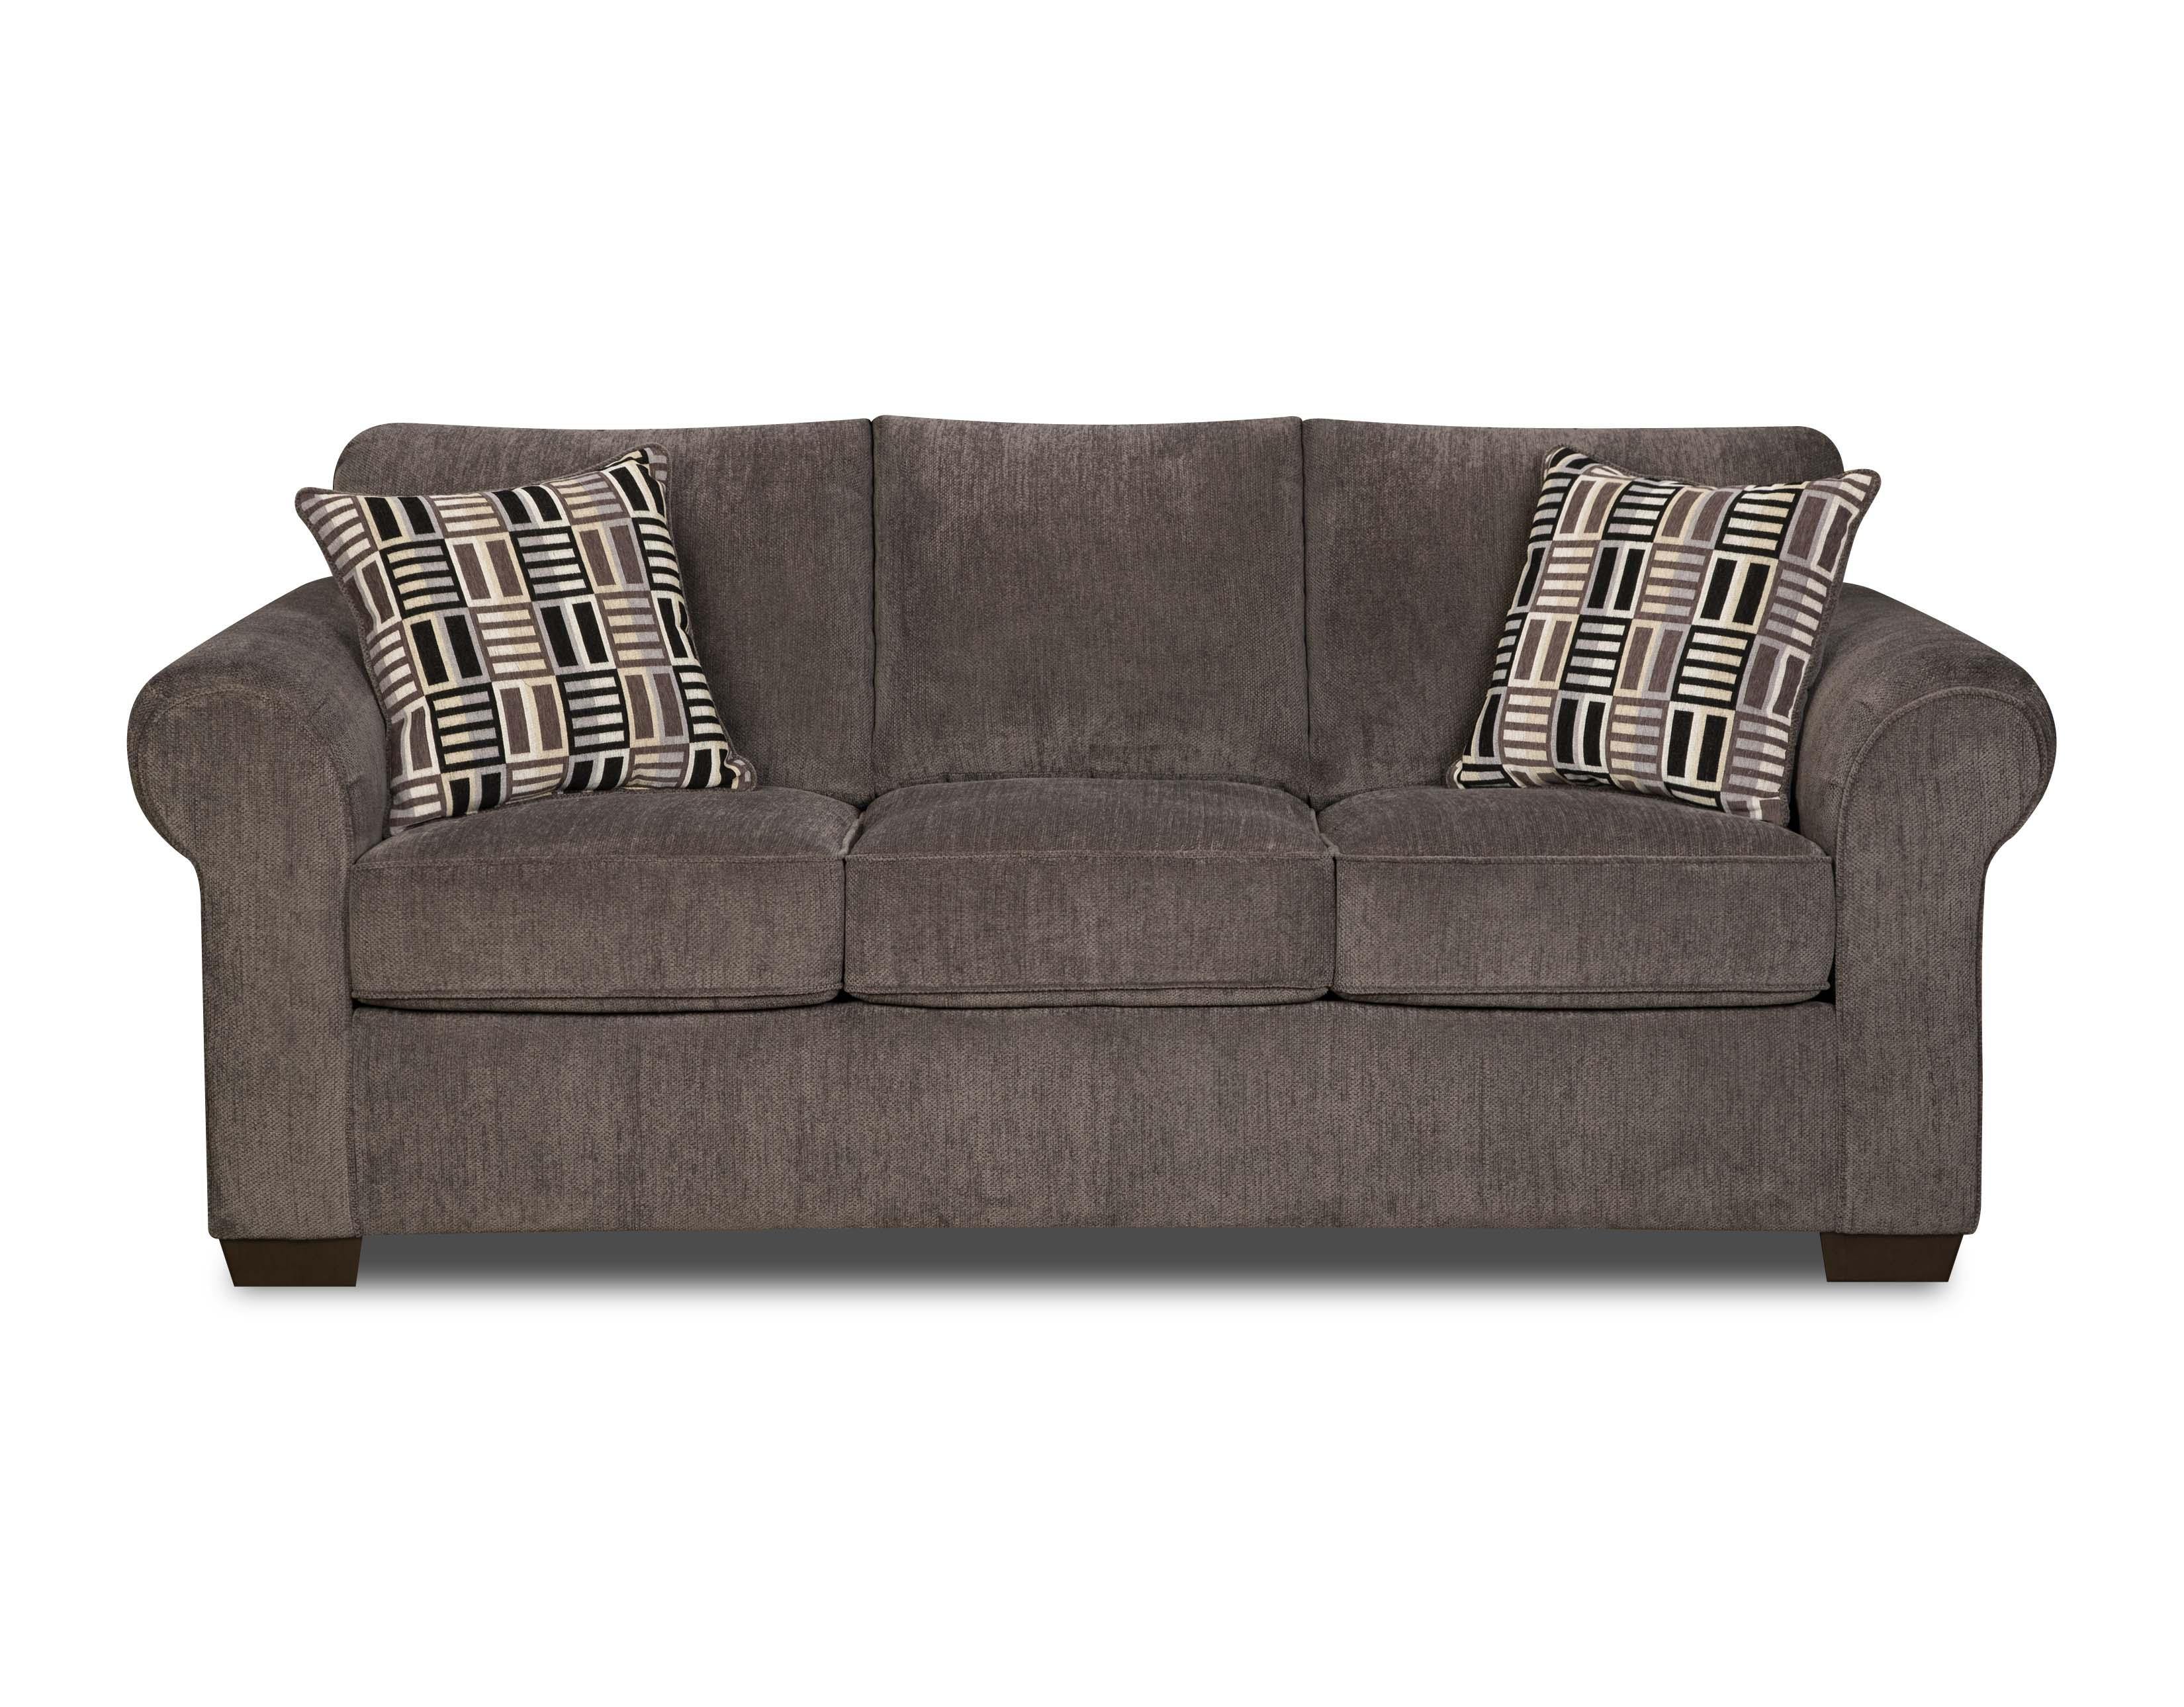 simmons upholstery simmons gray lola full size sleeper sofa